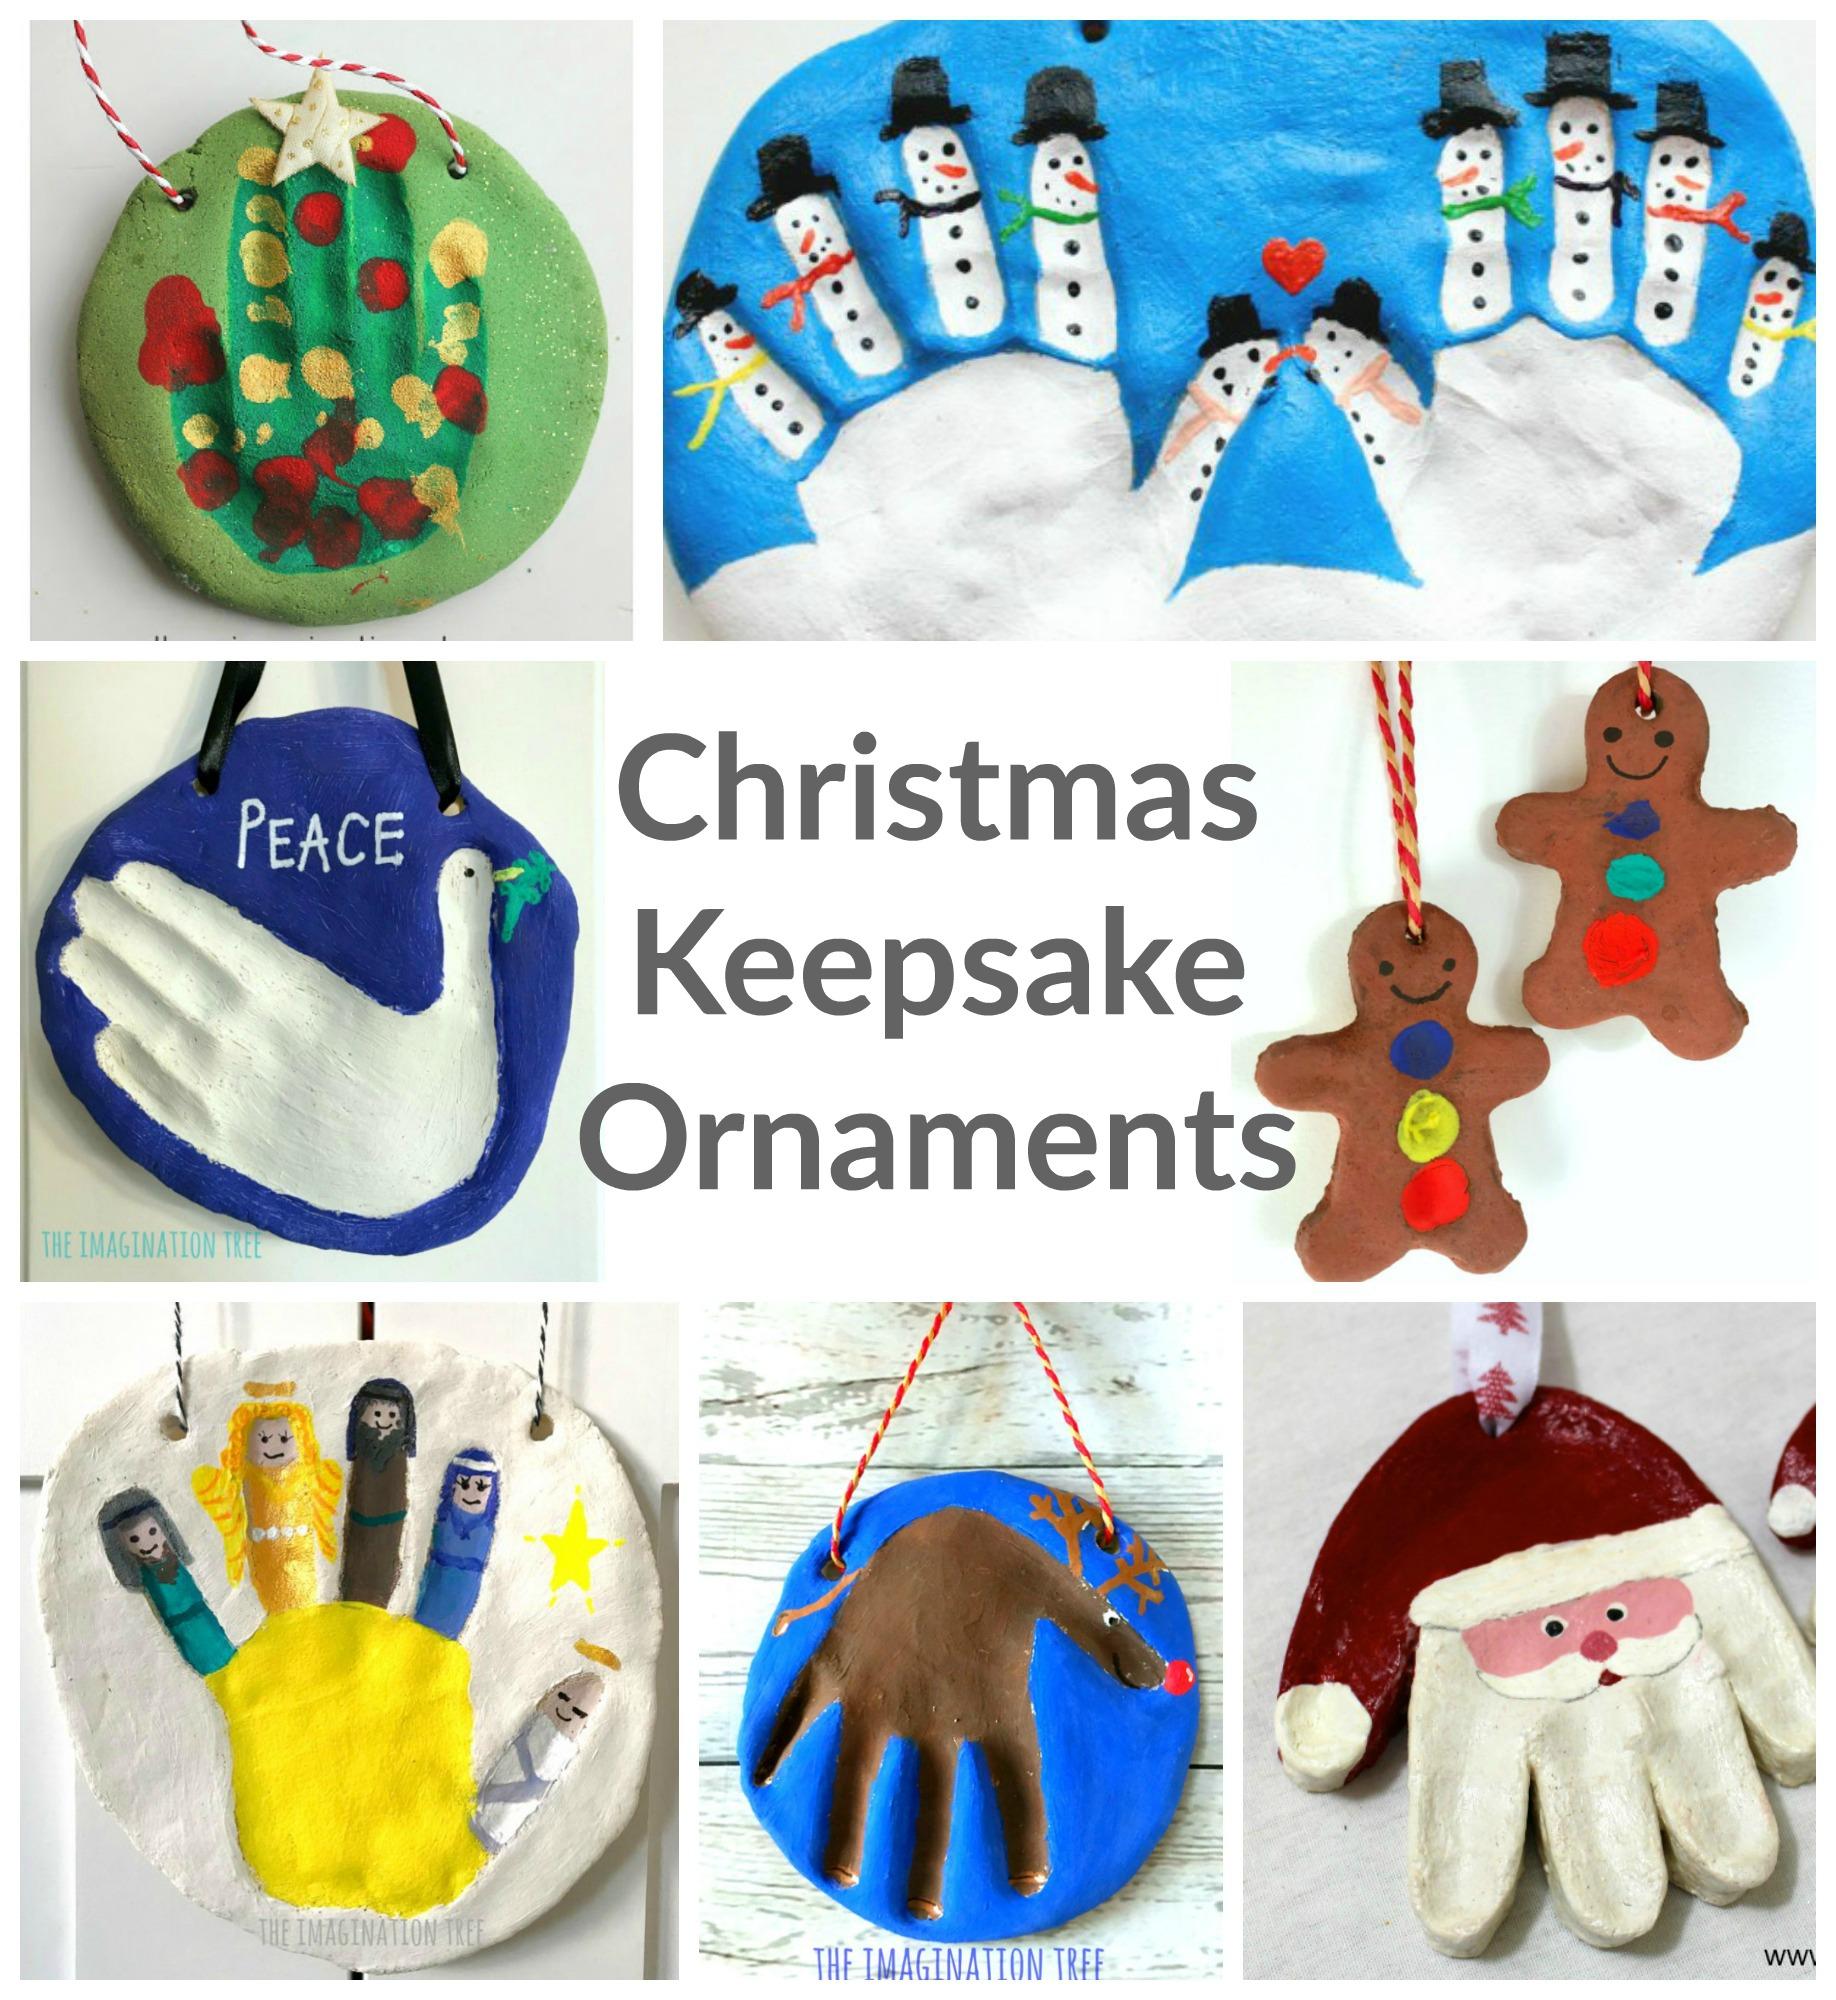 Christmas Salt Dough Ornament Keepsakes - The Imagination Tree